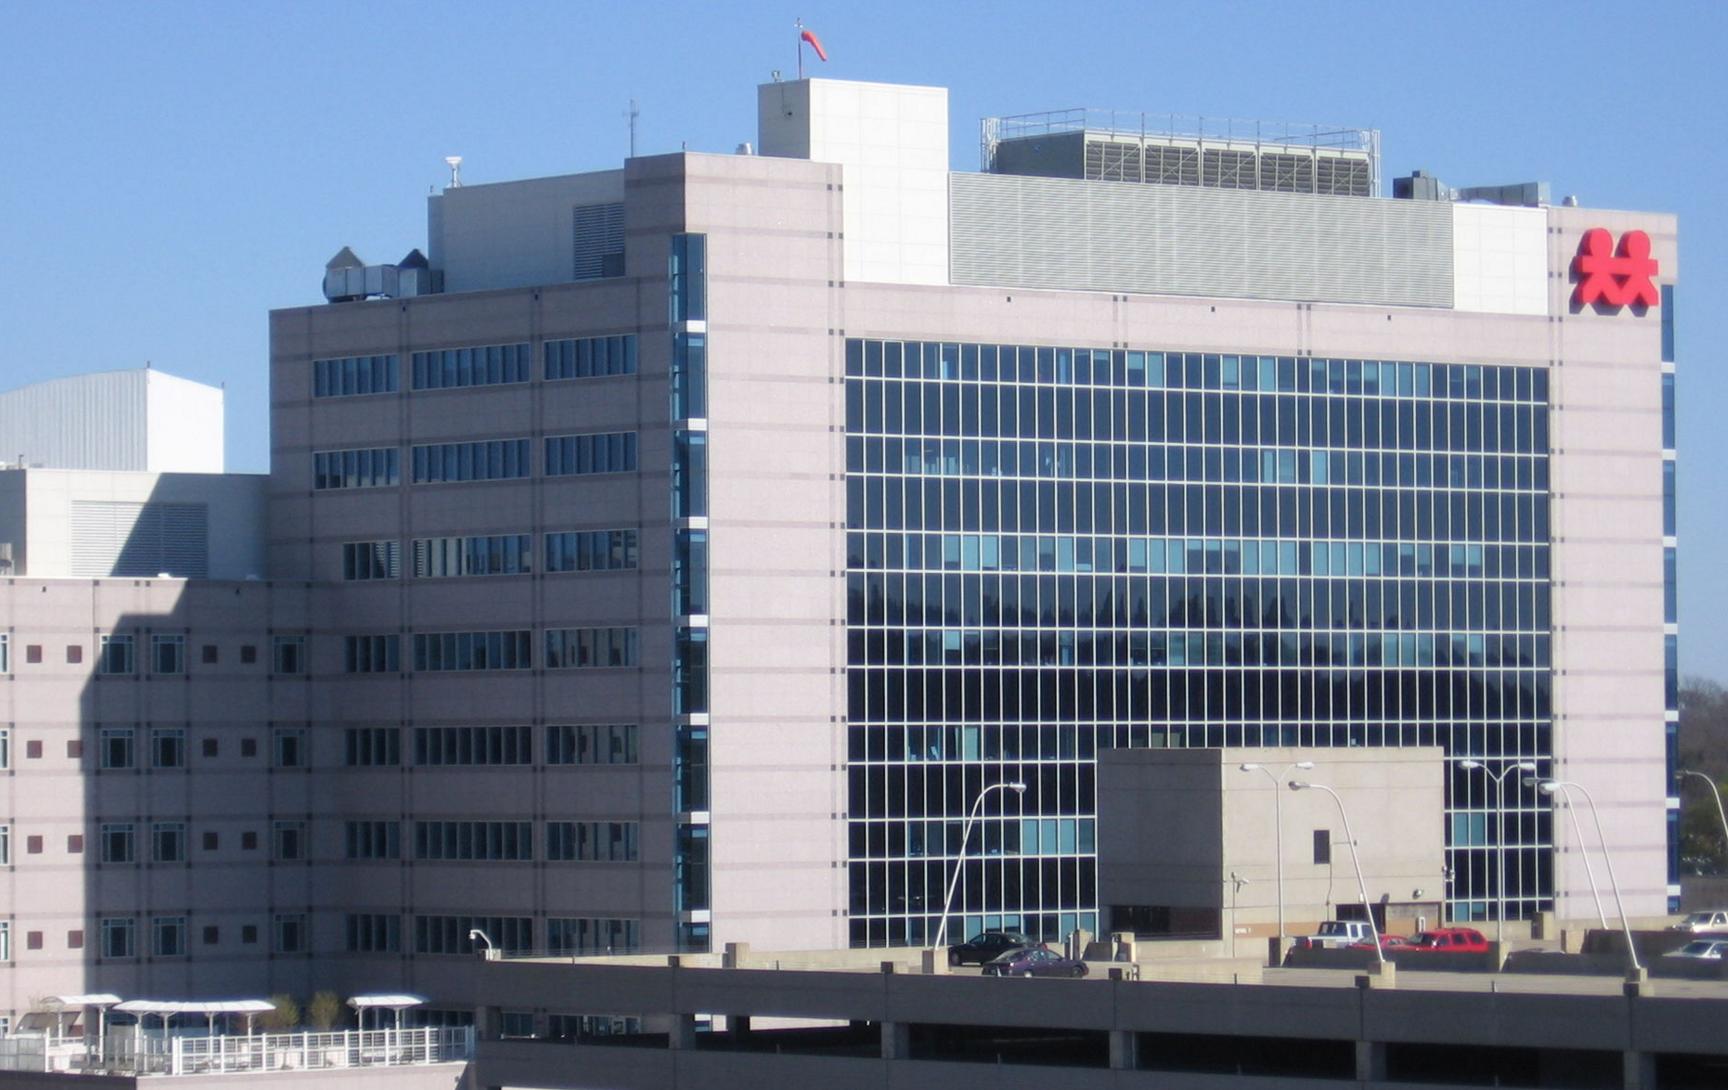 Monroe Carell Jr. Children's Hospital at Vanderbilt